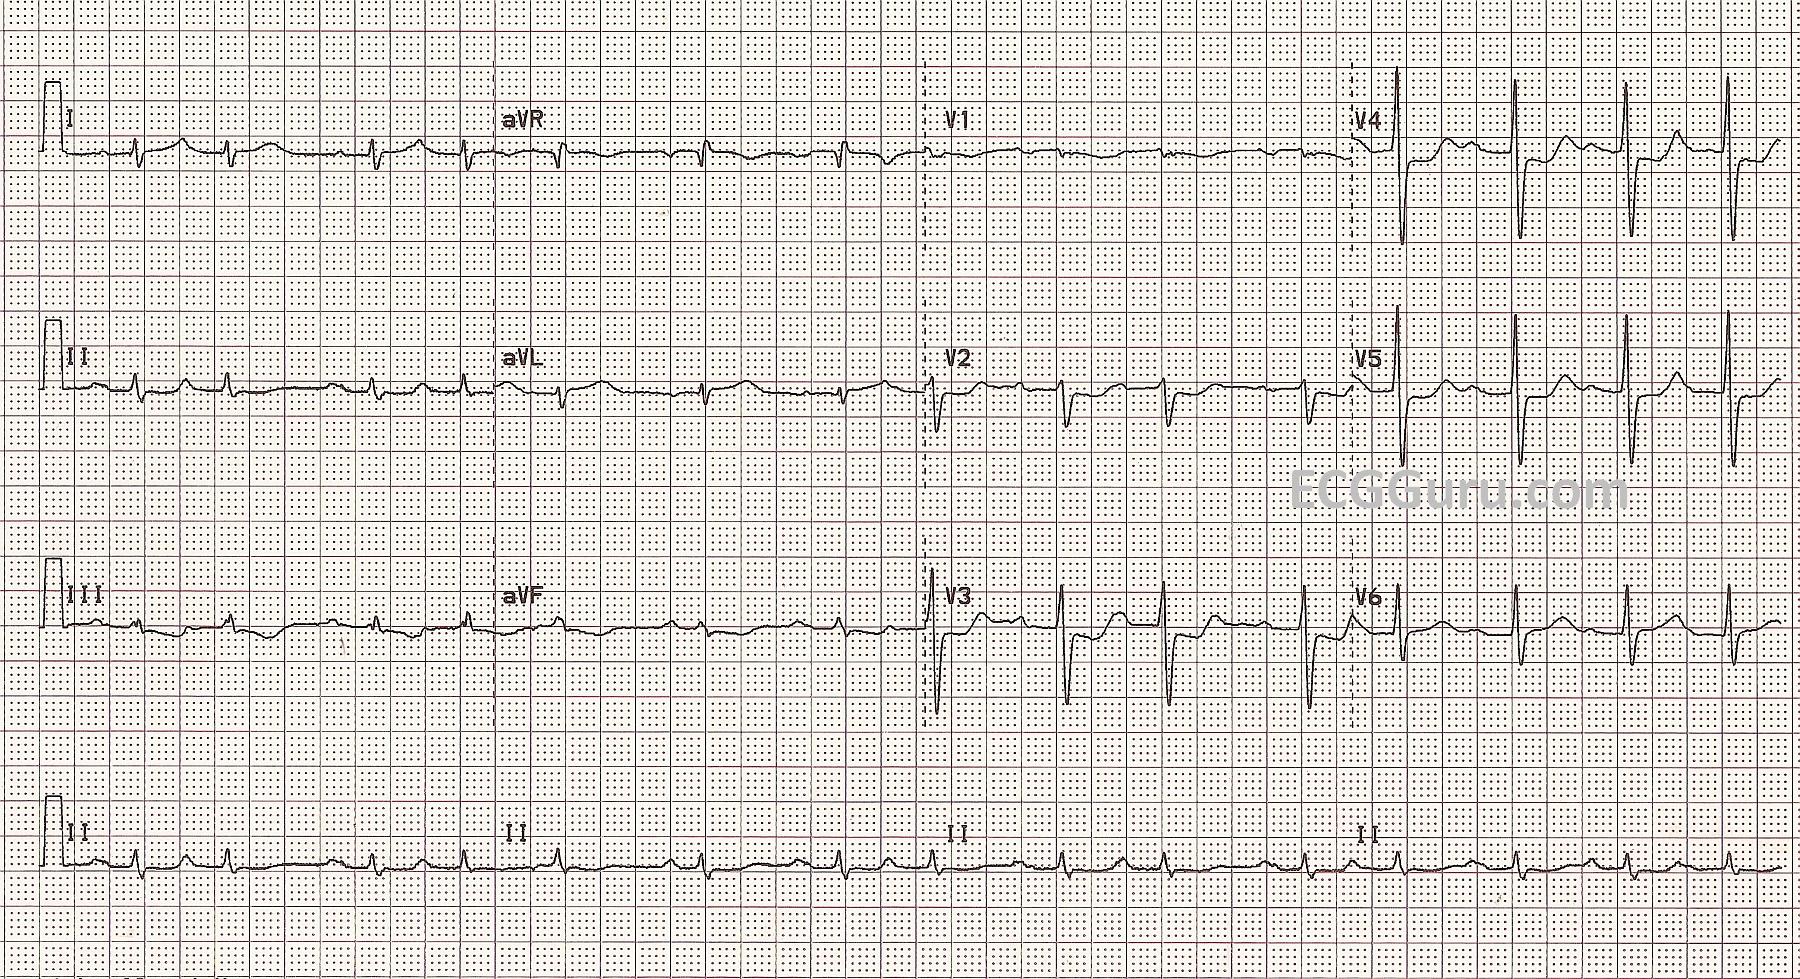 Acute M I Occluded Stents In Left Obtuse Marginal Artery Ecg Guru